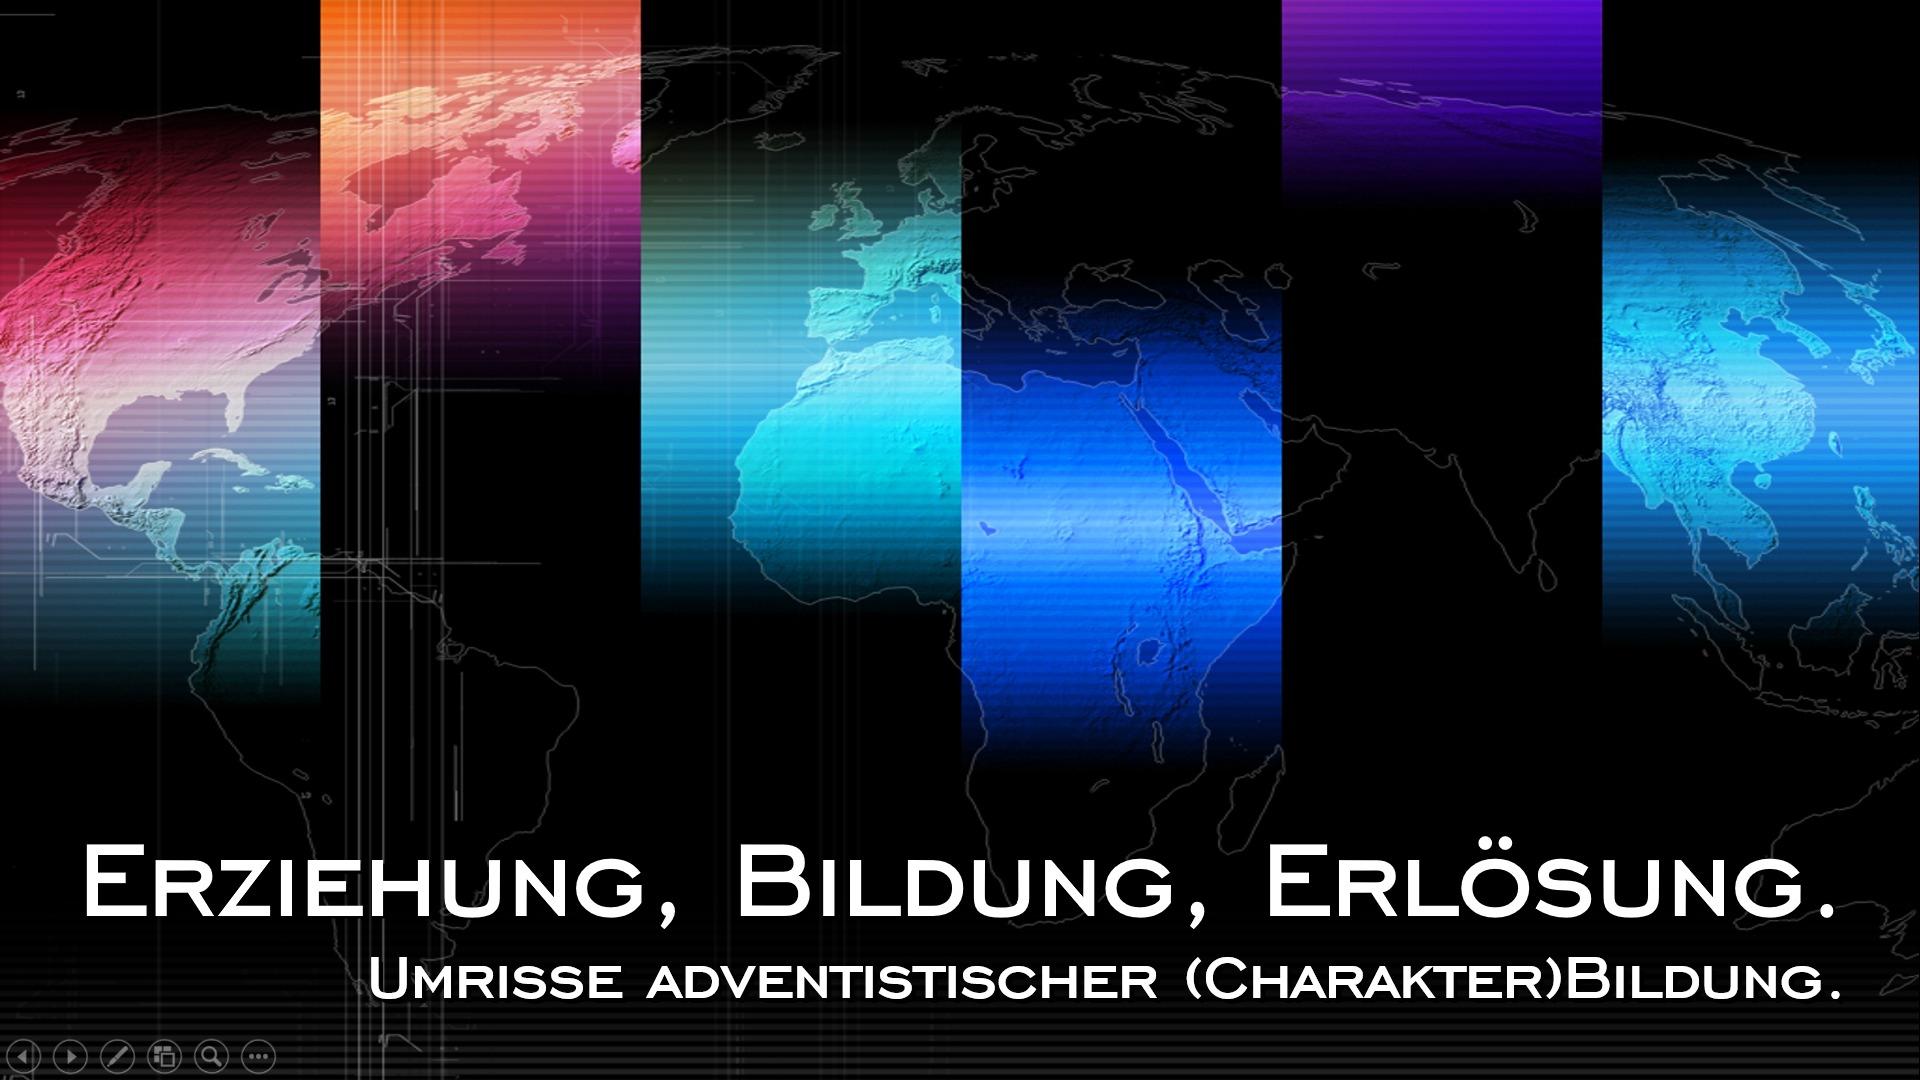 Erziehung. Bildung. Erlösung. Umrisse adventistischer (Charakter)Bildung. (TGGP 3)